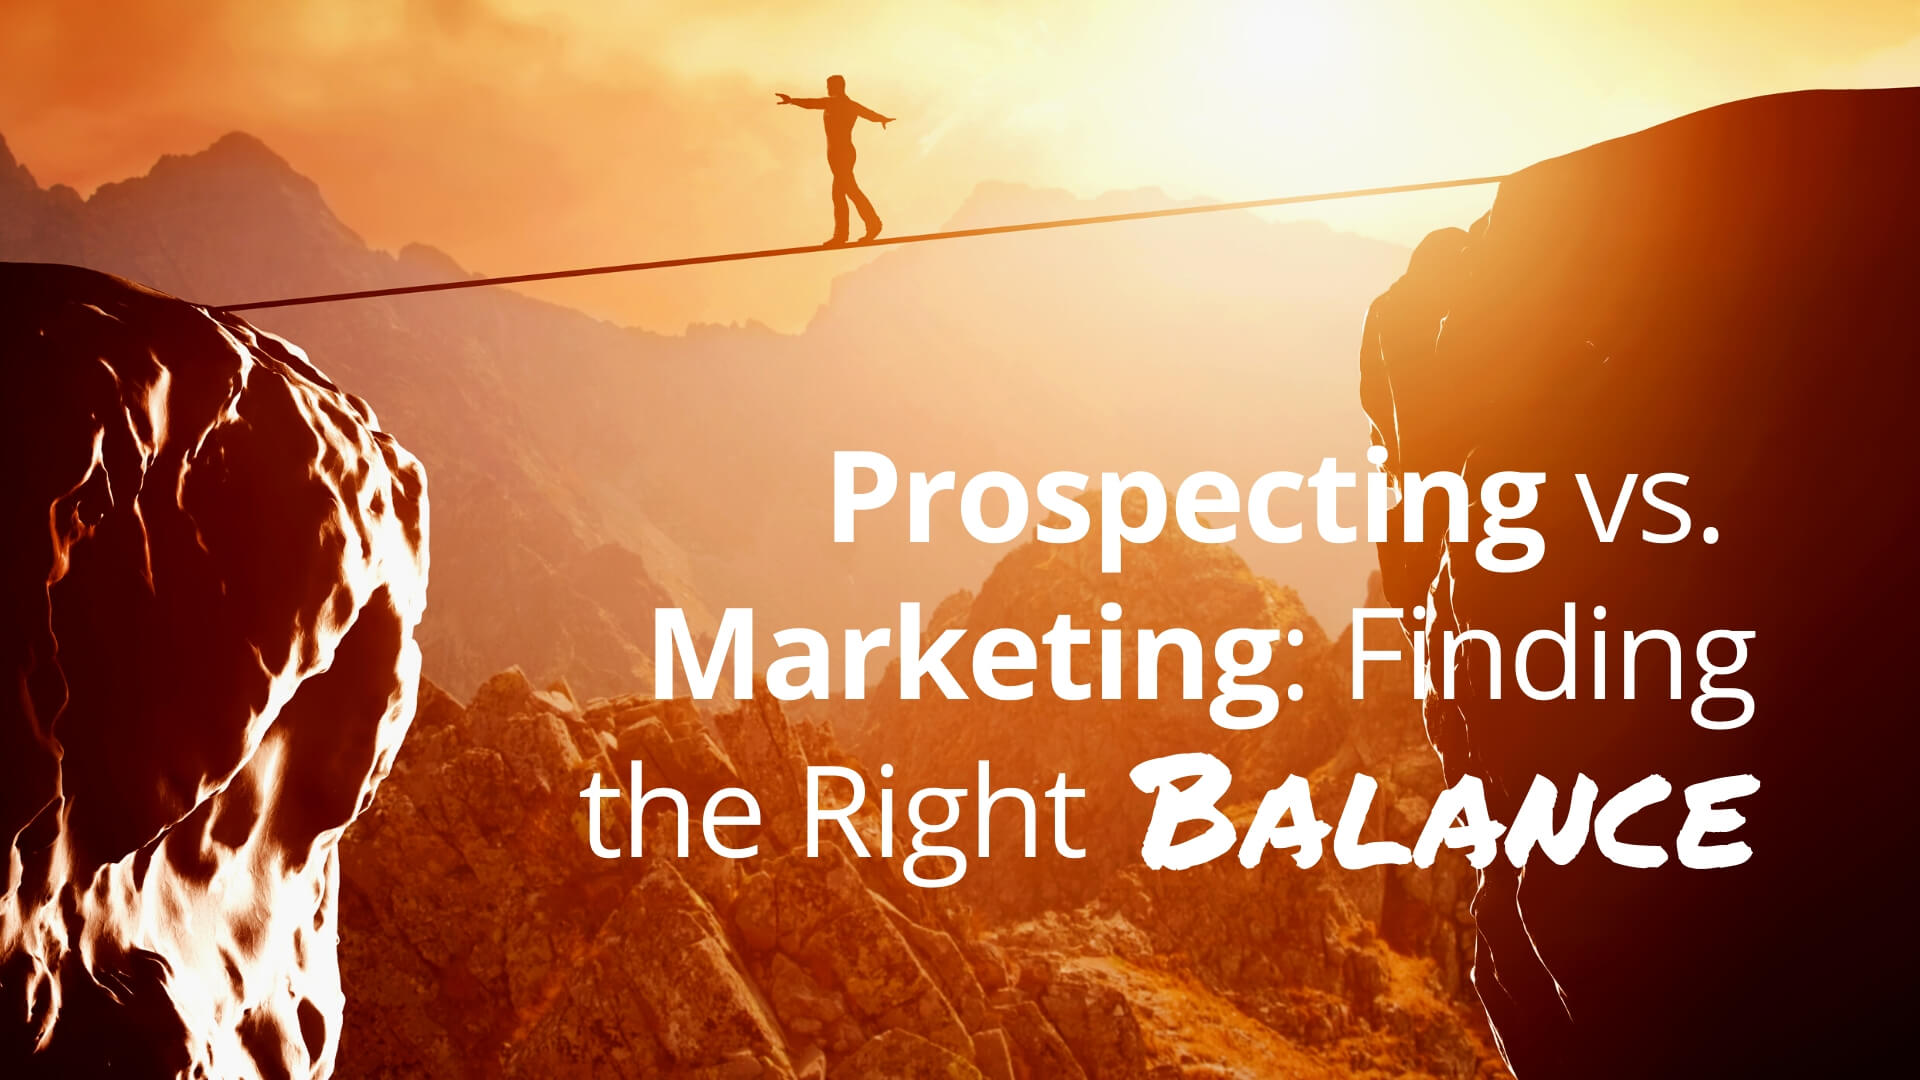 Prospecting vs Marketing